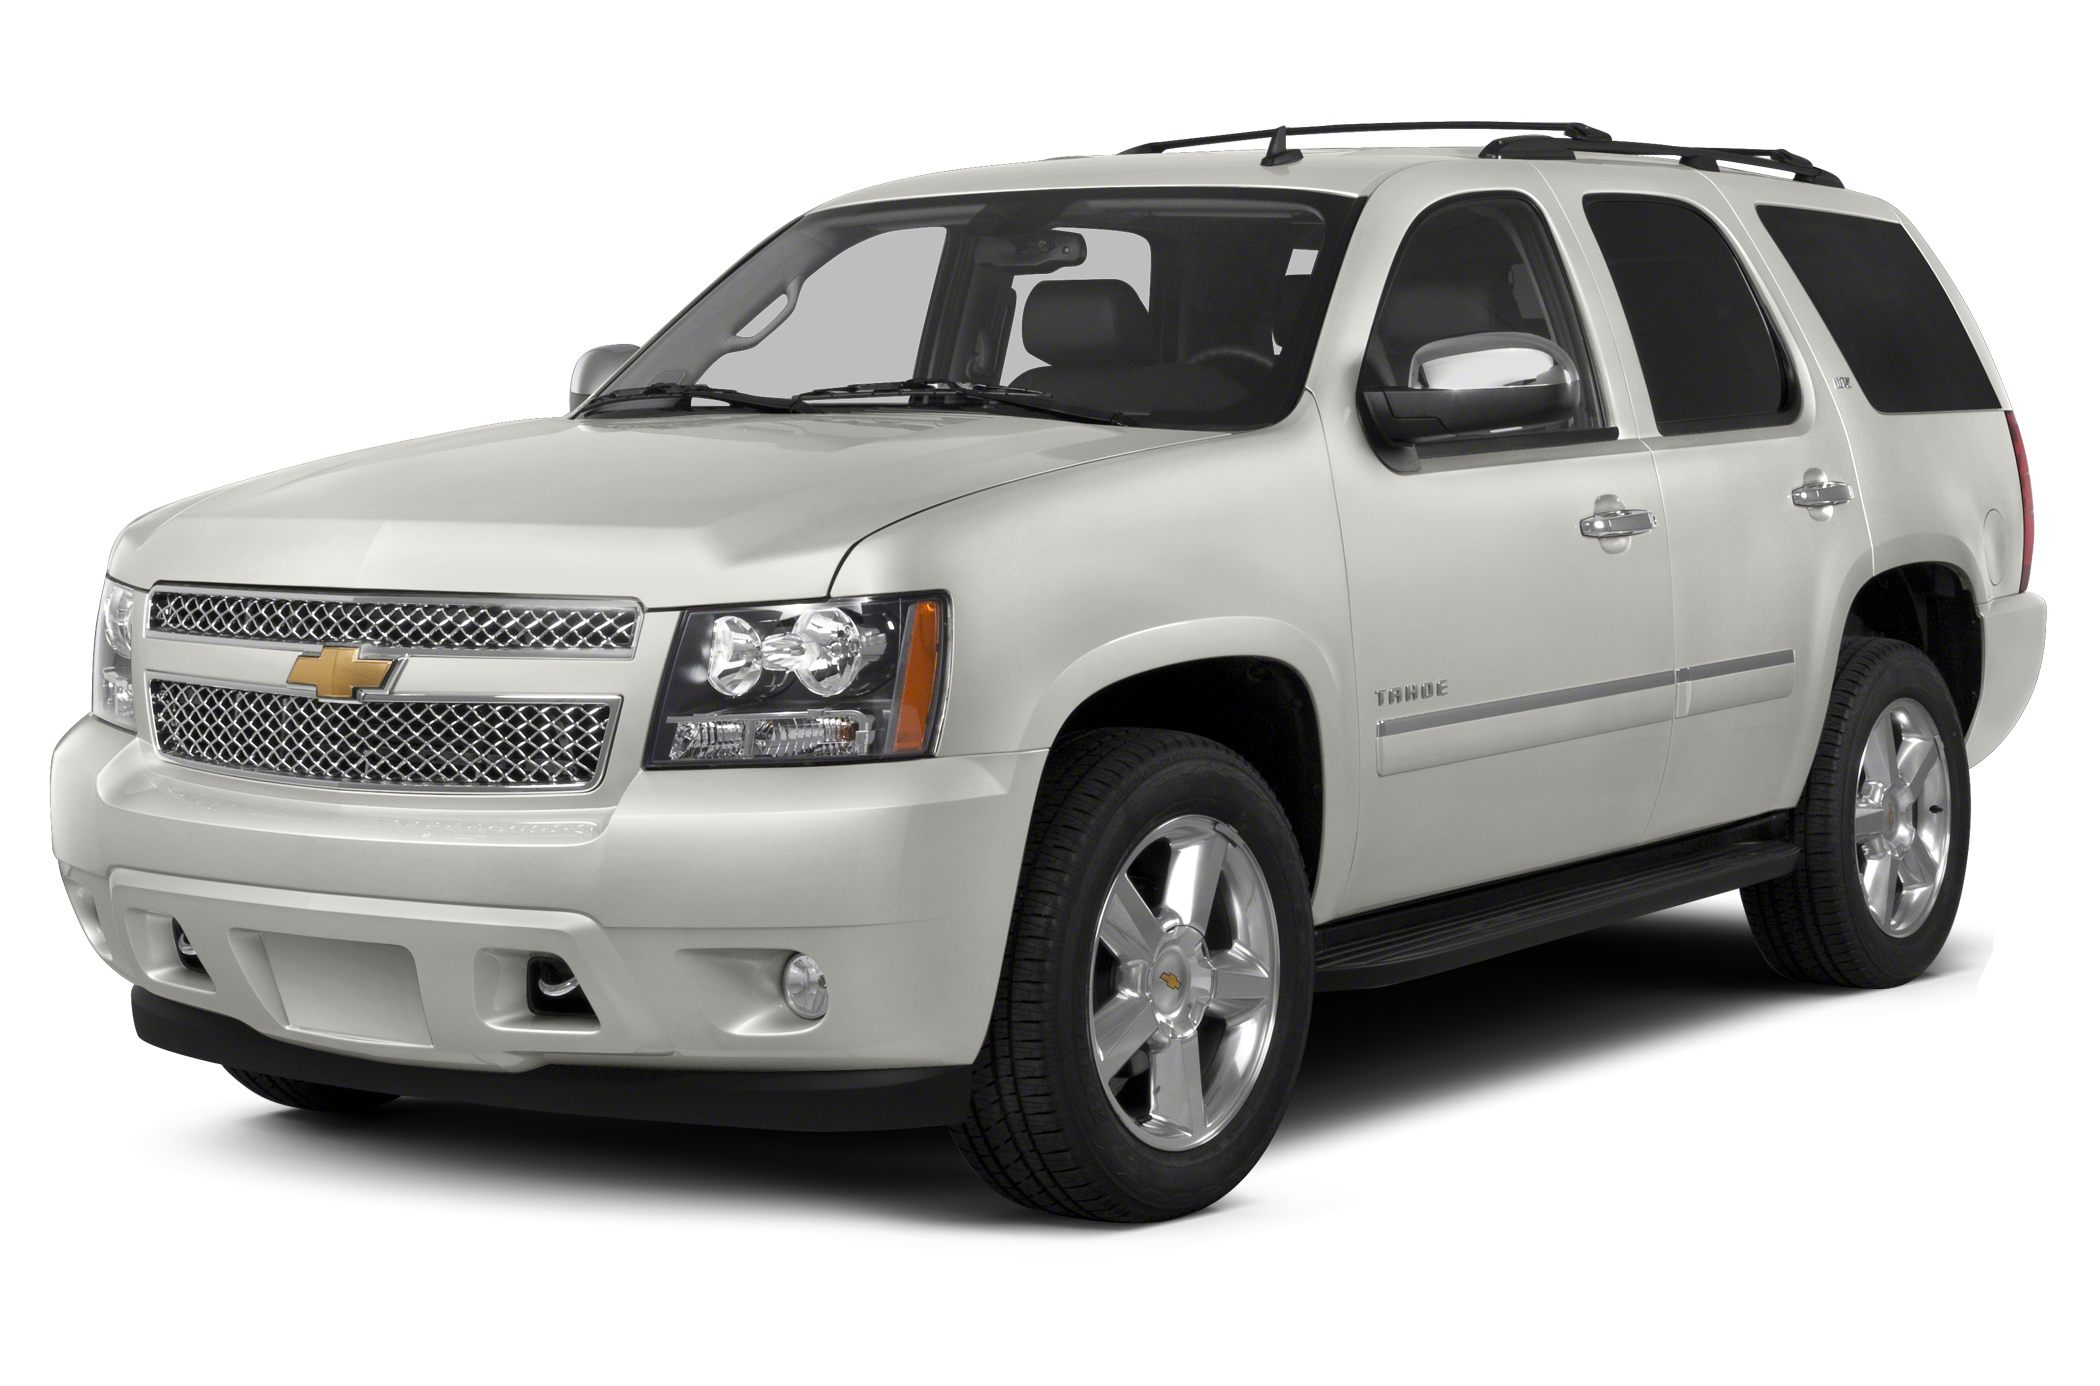 10 Chevrolet Tahoe Pictures | 2013 chevrolet tahoe